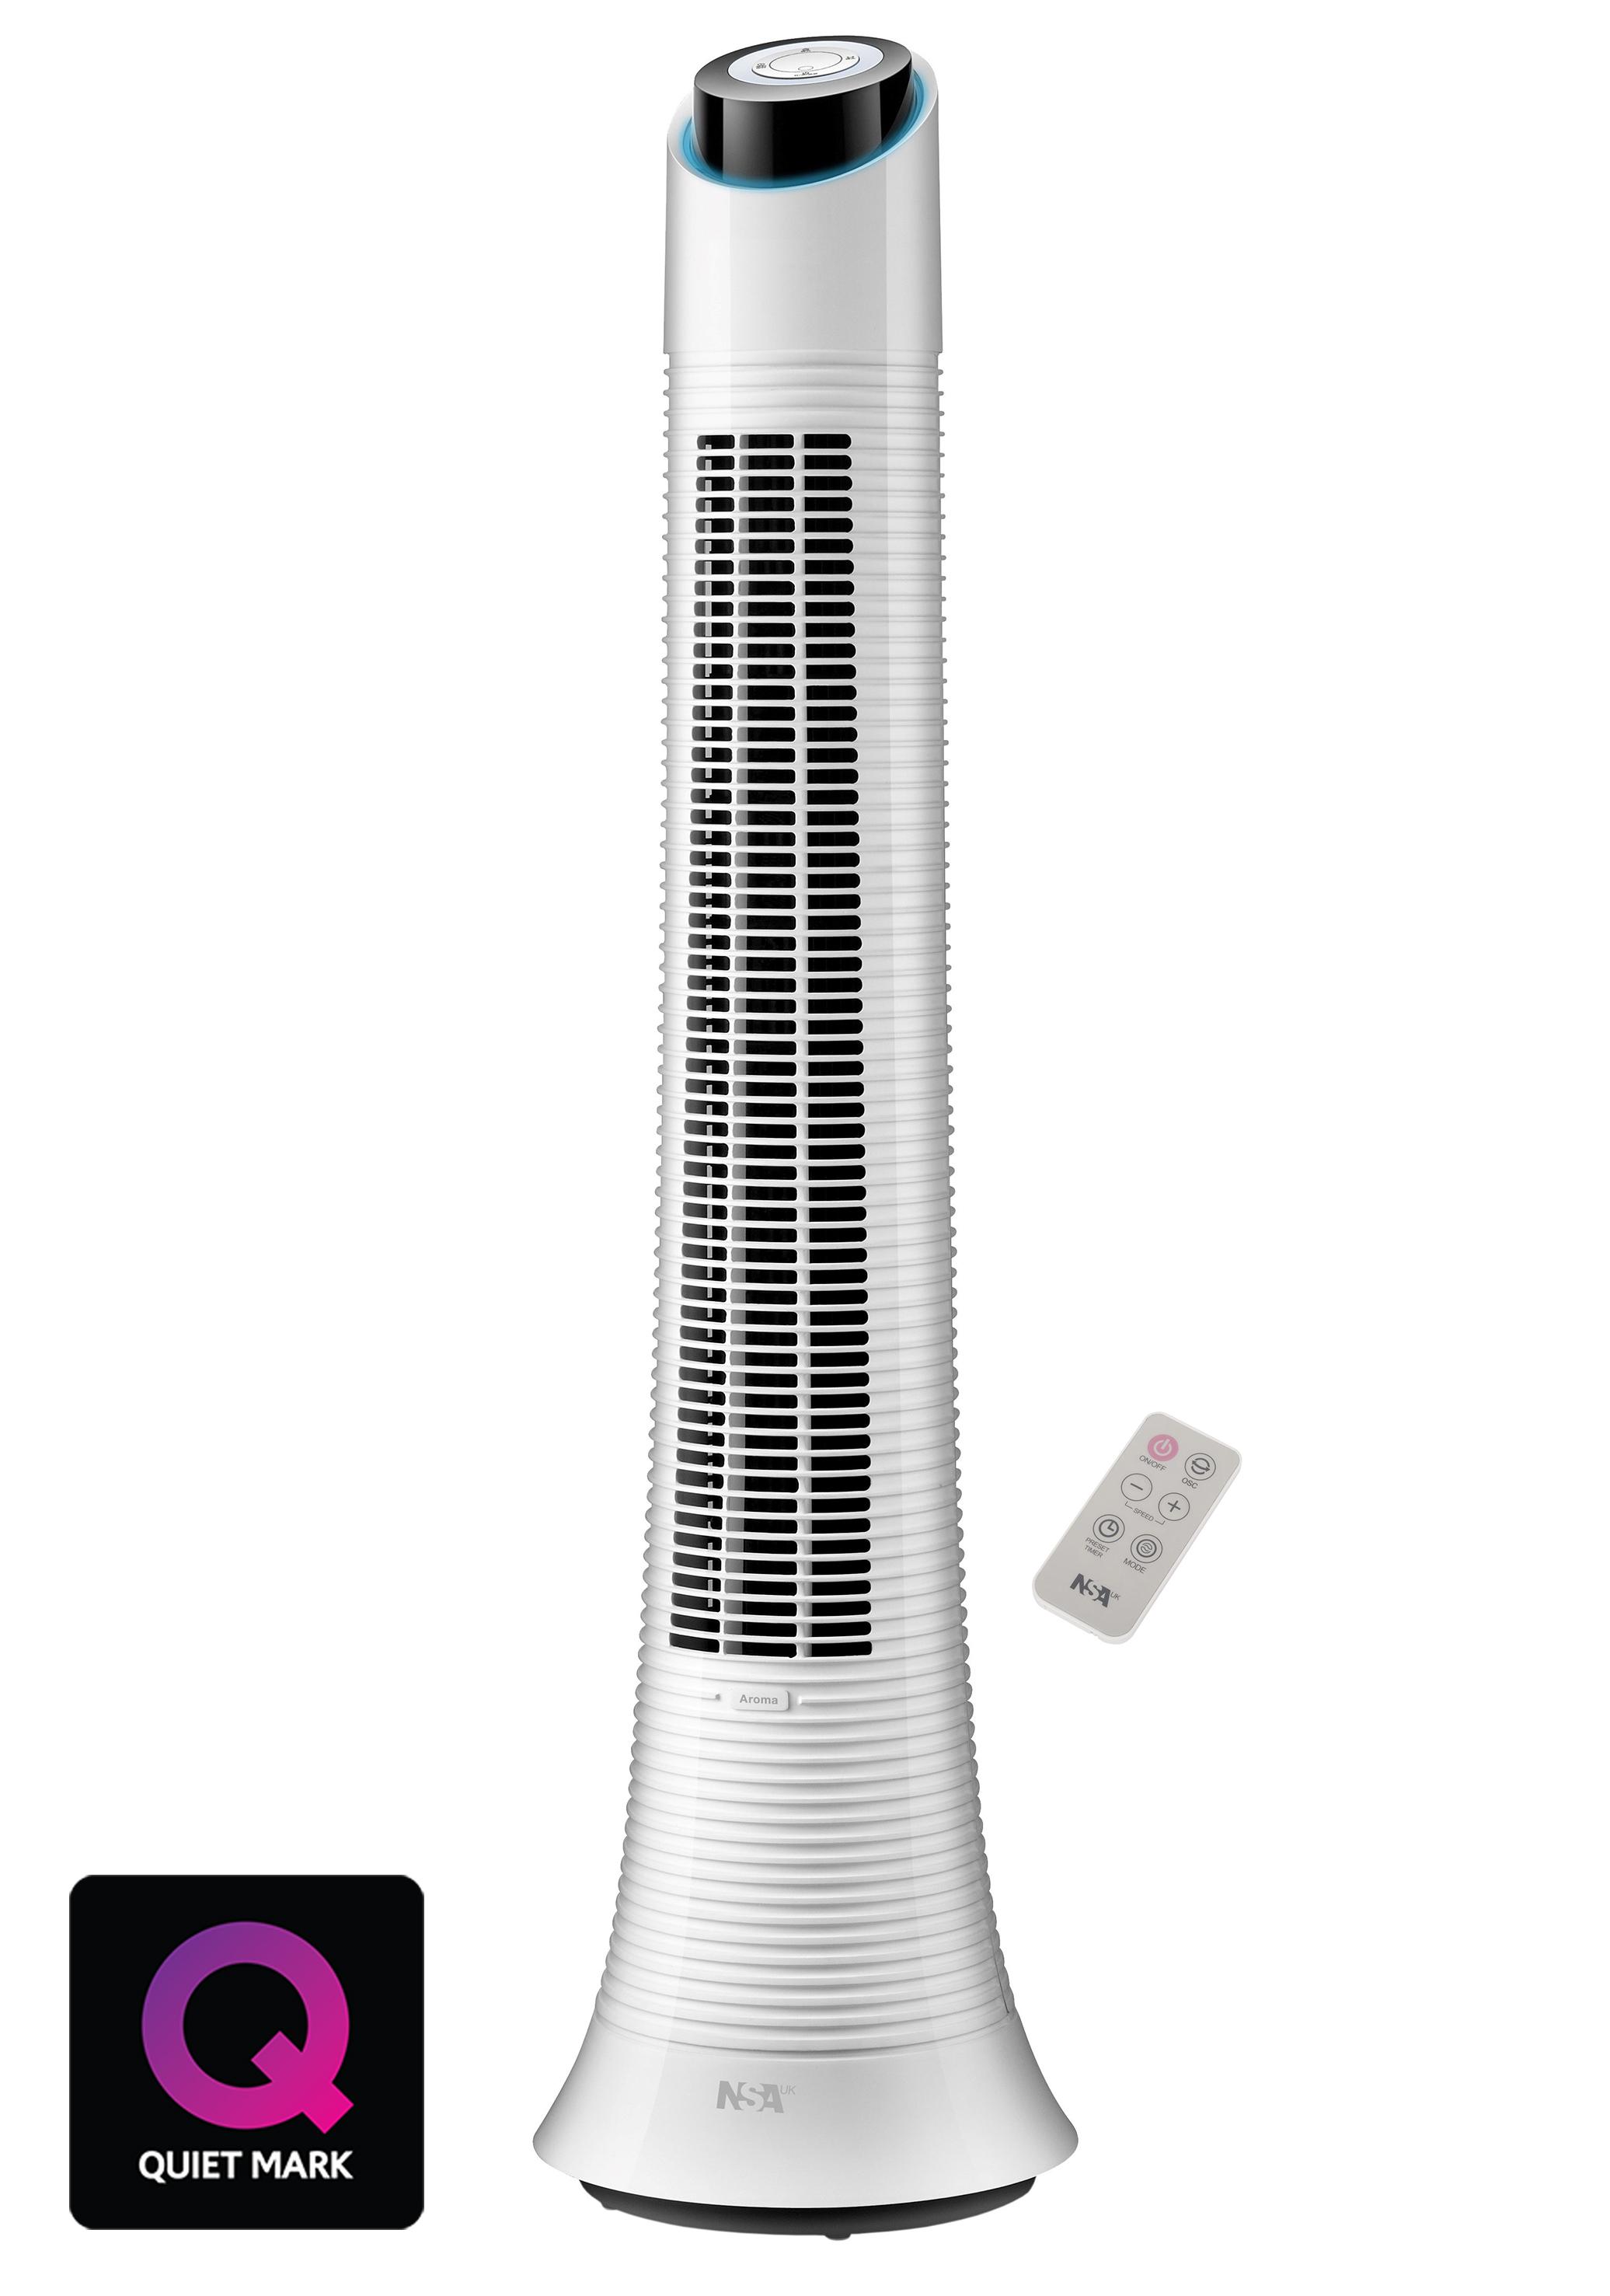 NSAuk TRFDEC-50RC rechargeable column fan, £199.99